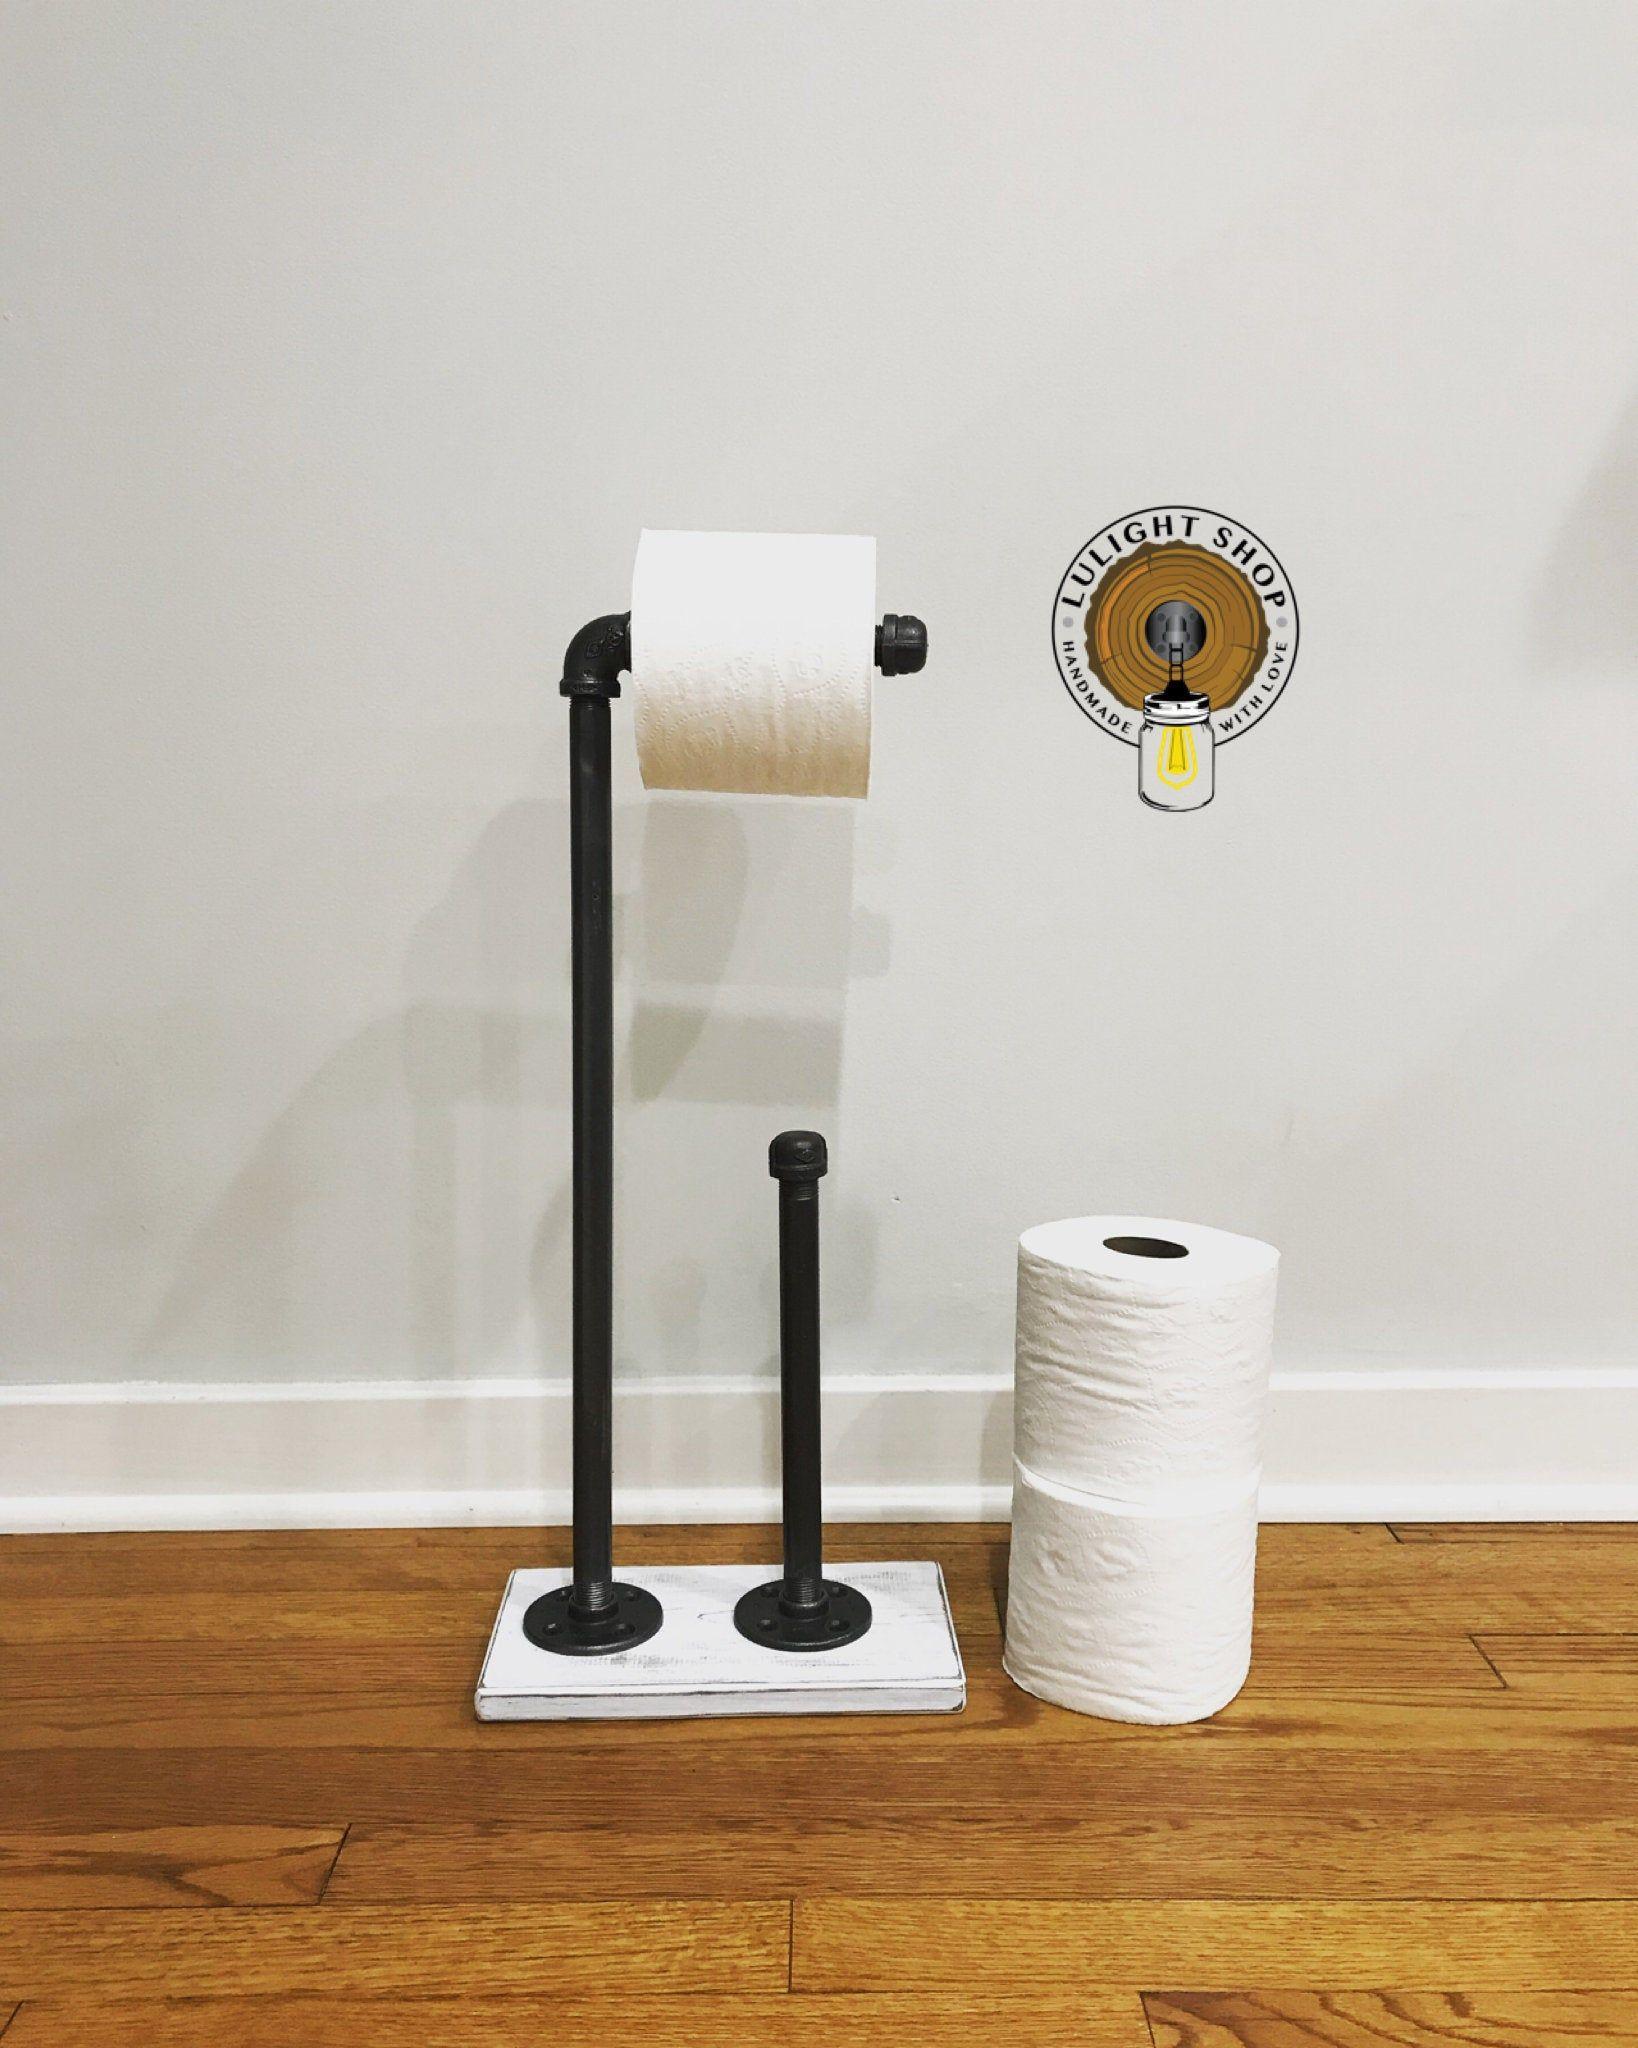 Whitewash Industrial Toilet Paper Storage Stand Wood Holder Toilet Paper Holder Floor Sta Toilet Paper Storage Unique Toilet Paper Holder Industrial Toilets